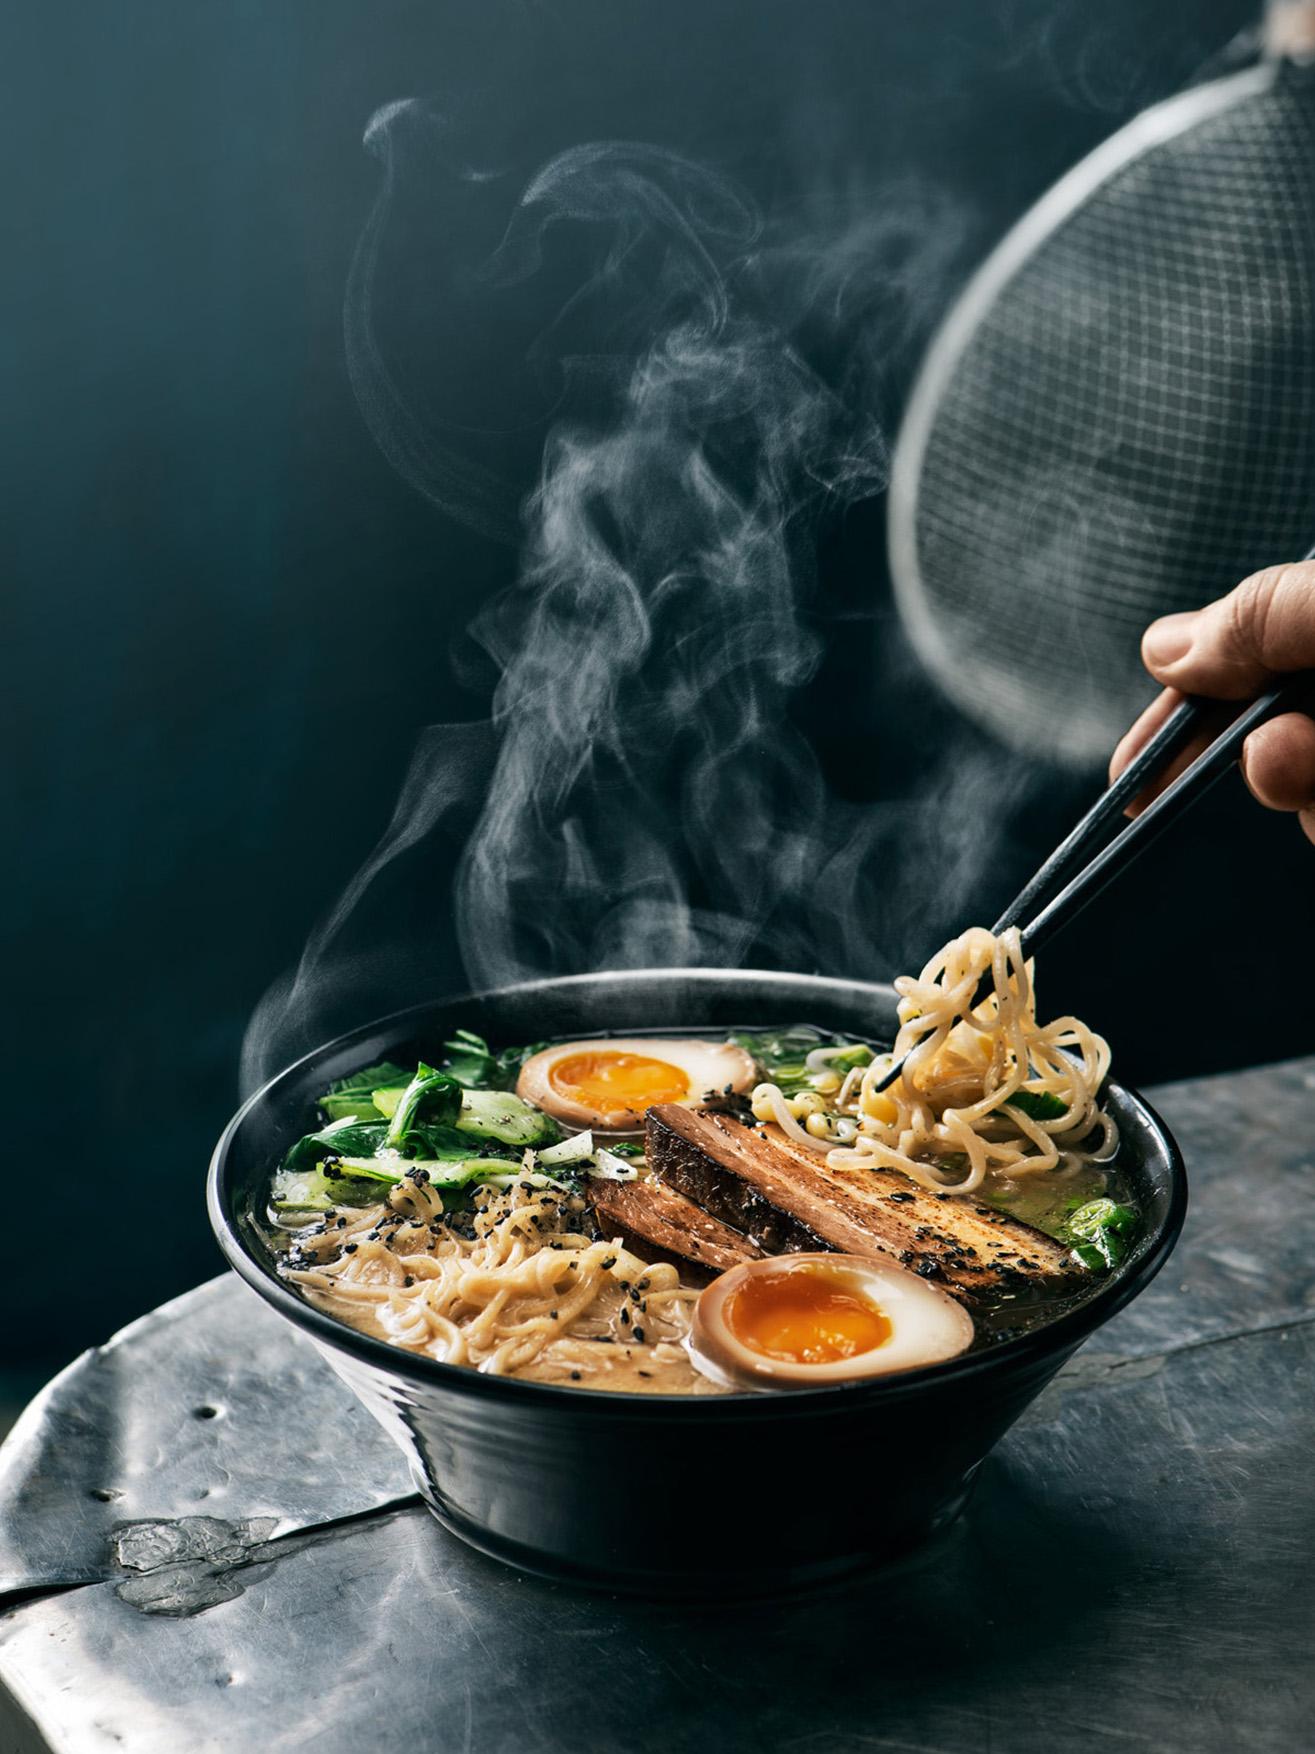 tove is back in business! - Food stylist TOVE NILSSON / SKARP CREATIVE